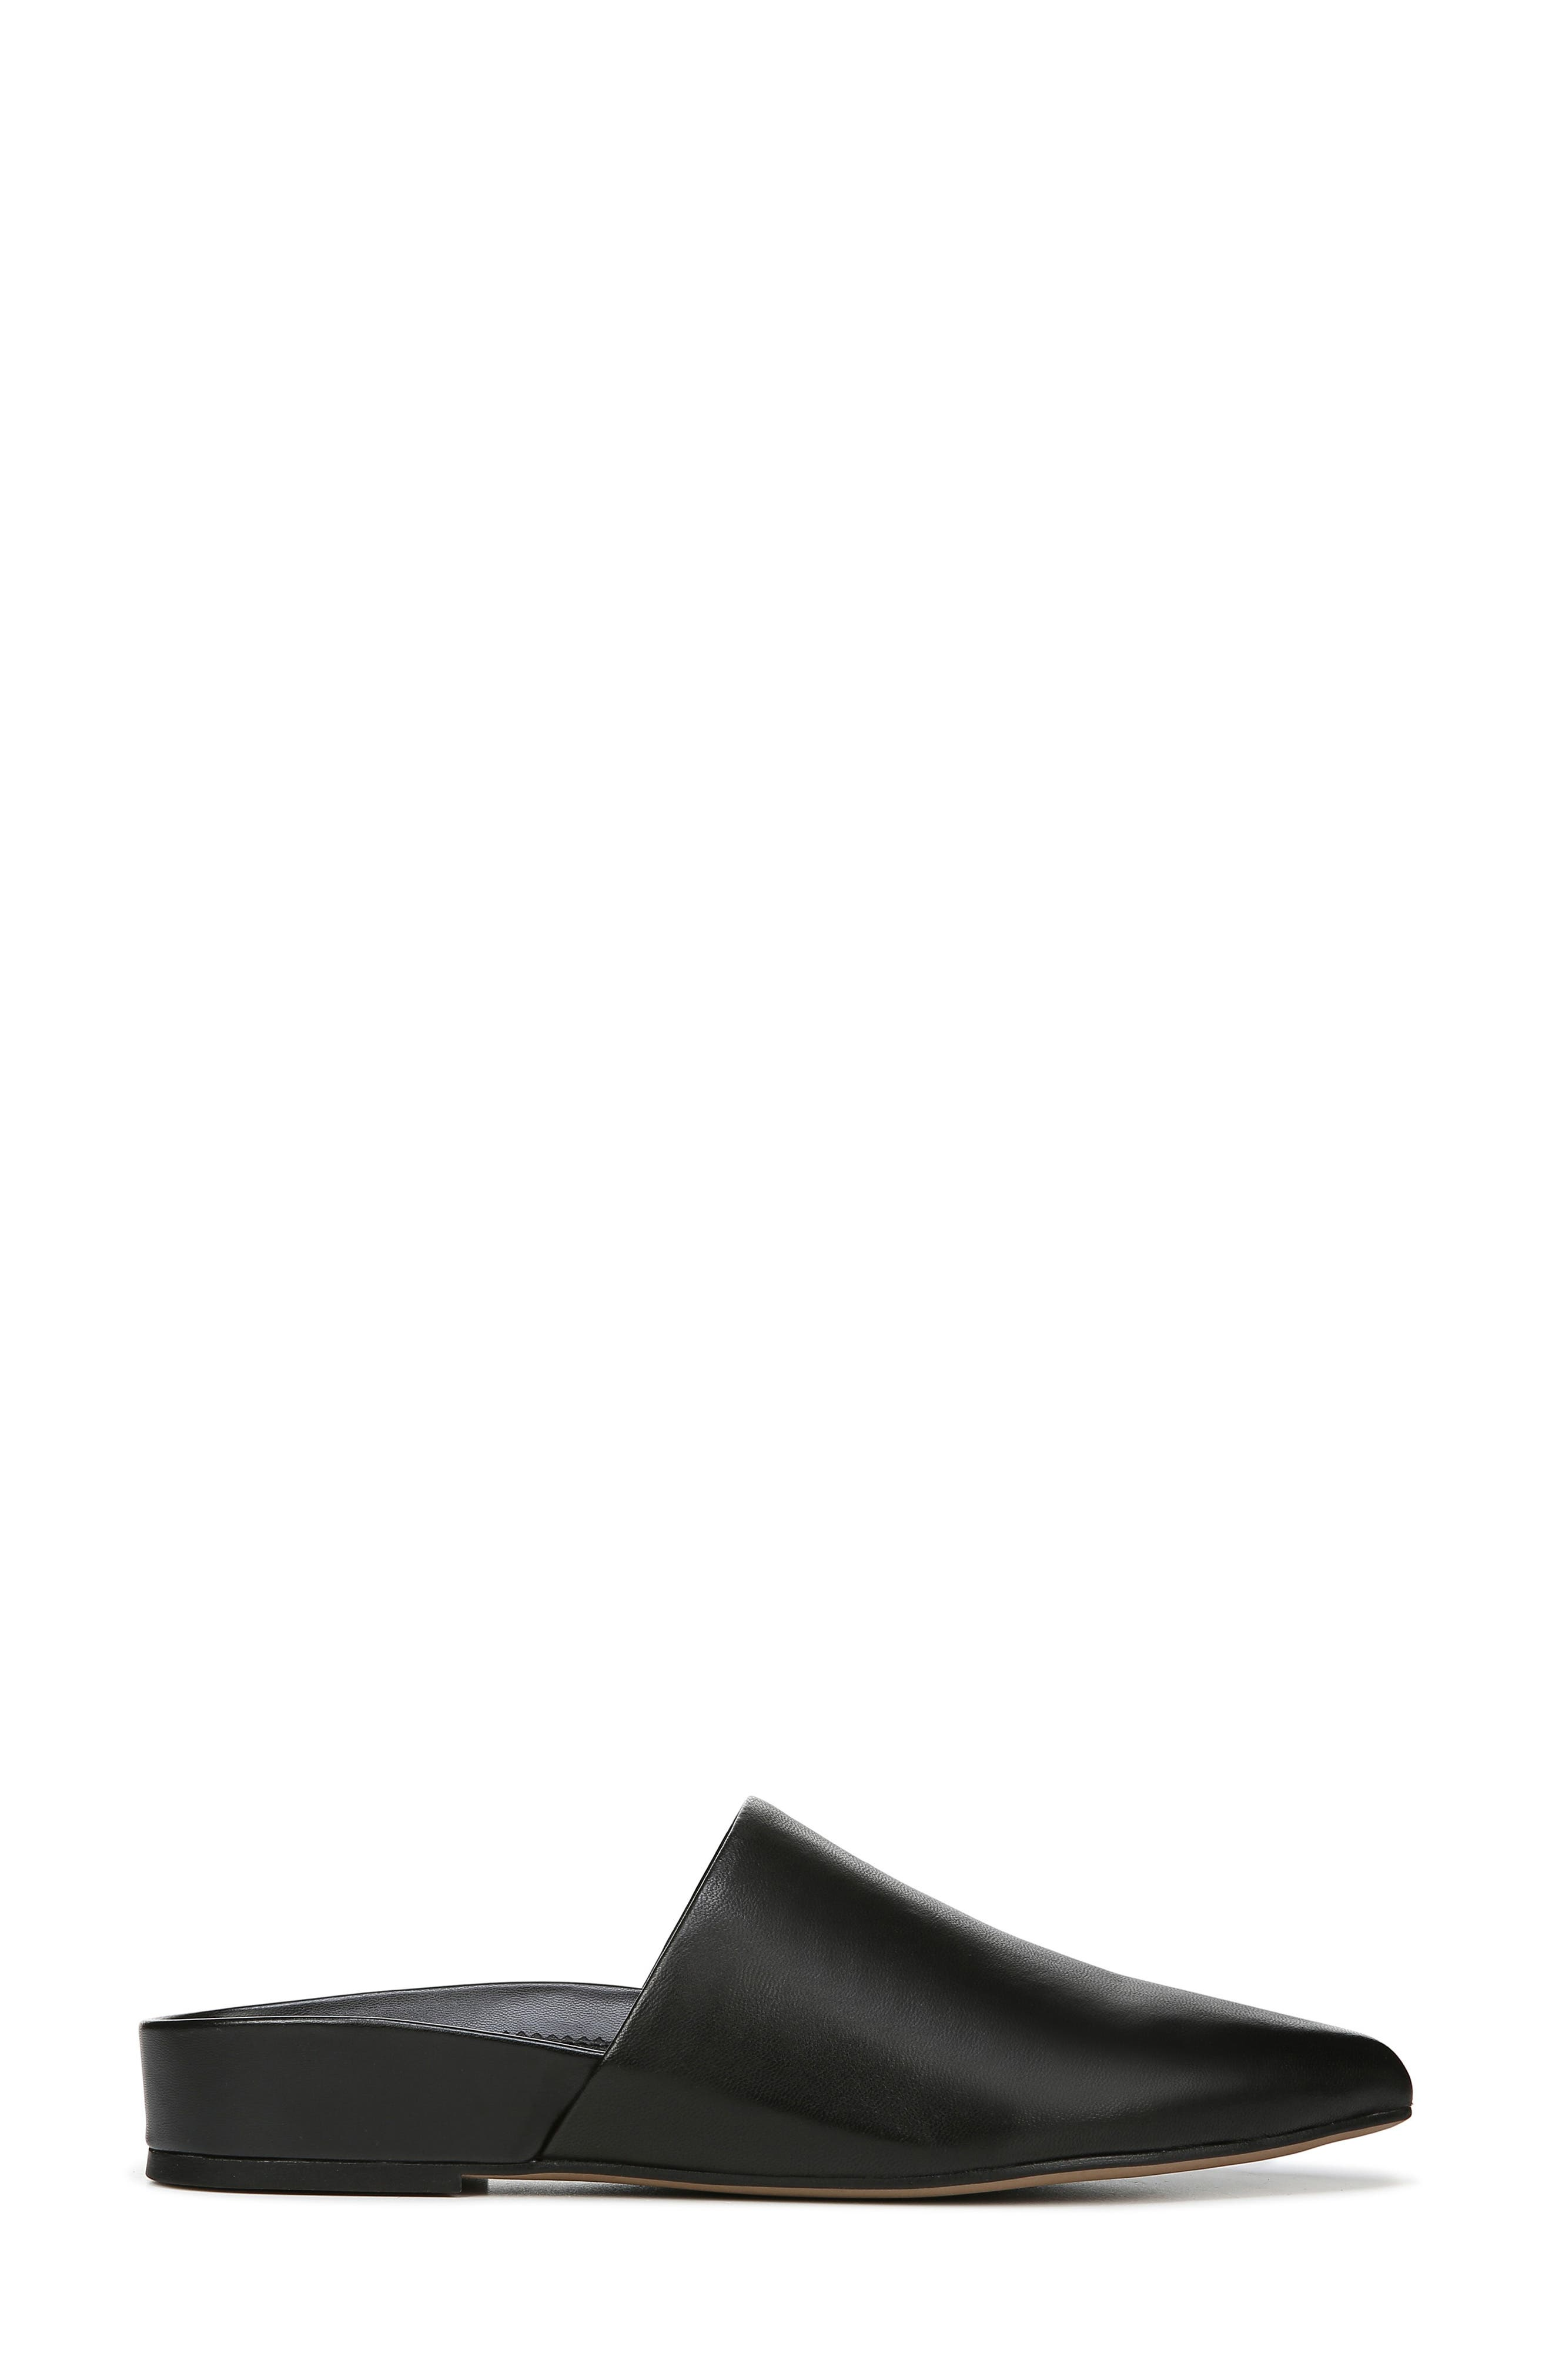 SARTO BY FRANCO SARTO,                             Irma Pointy Toe Mule,                             Alternate thumbnail 3, color,                             BLACK LEATHER